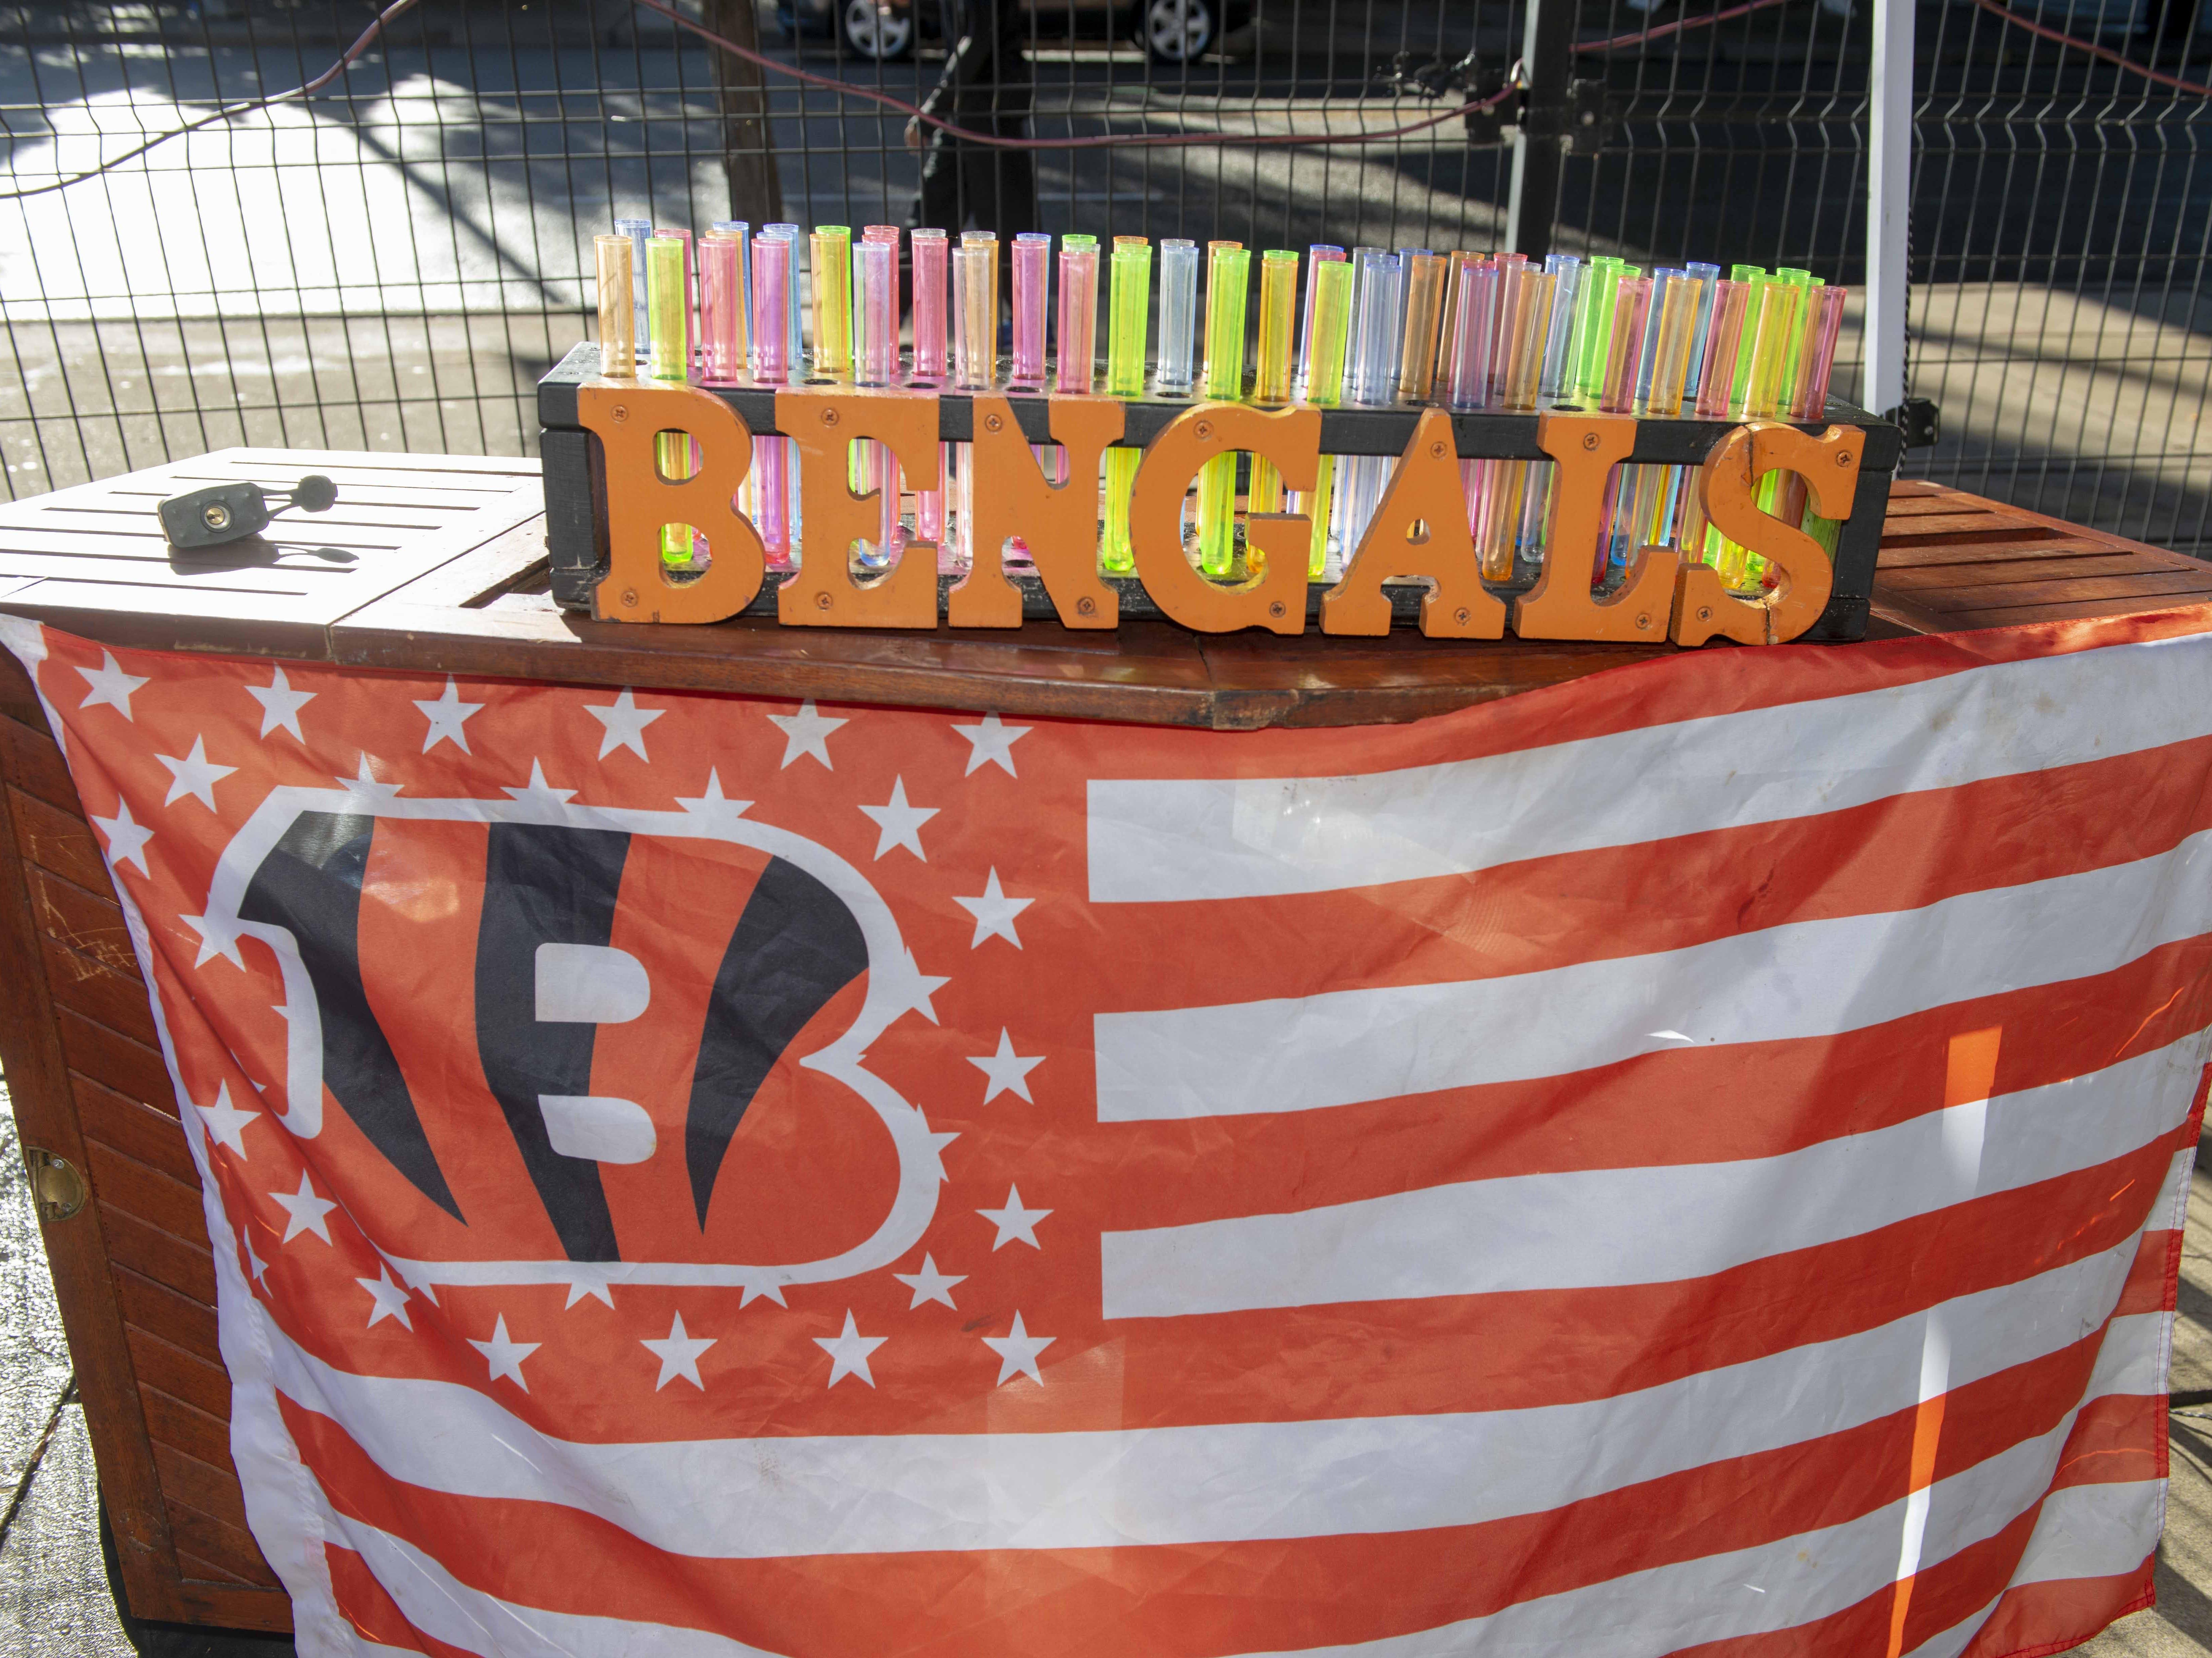 Cincinnati Bengals fans showed up for tailgating parties as the Cincinnati Bengals hosted the Denver Broncos at Paul Brown Stadium Sunday, December 2, 2018. Bengal Shots.